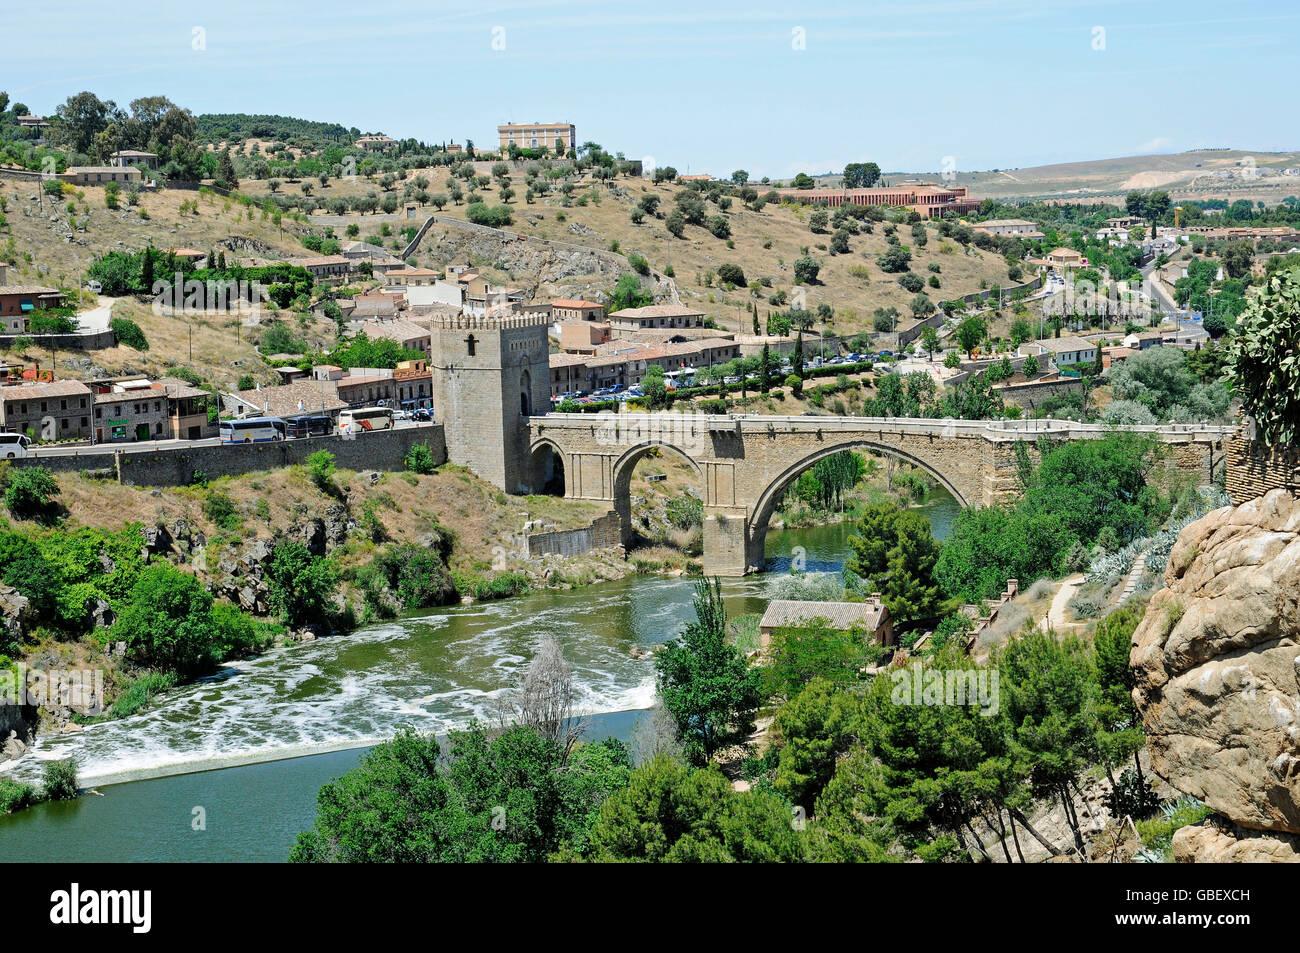 Puente de San Martin, Tajo river, Toledo, Castile-La Mancha, Spain - Stock Image